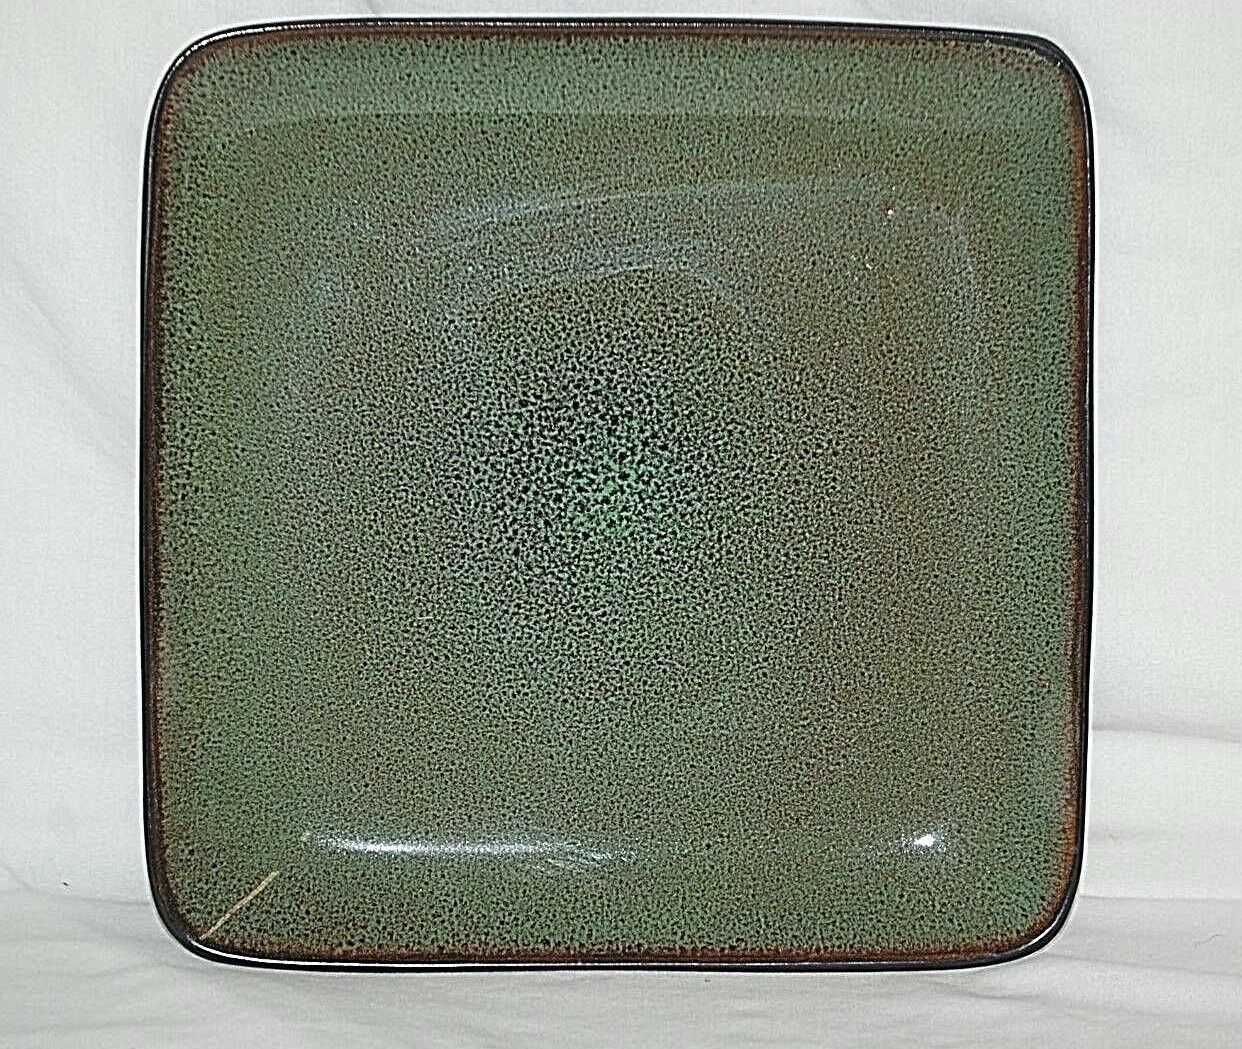 Rave Green Square Home Trends 10-5/8 Dinner Plate Mottled Green w Splashed Brown - $19.79